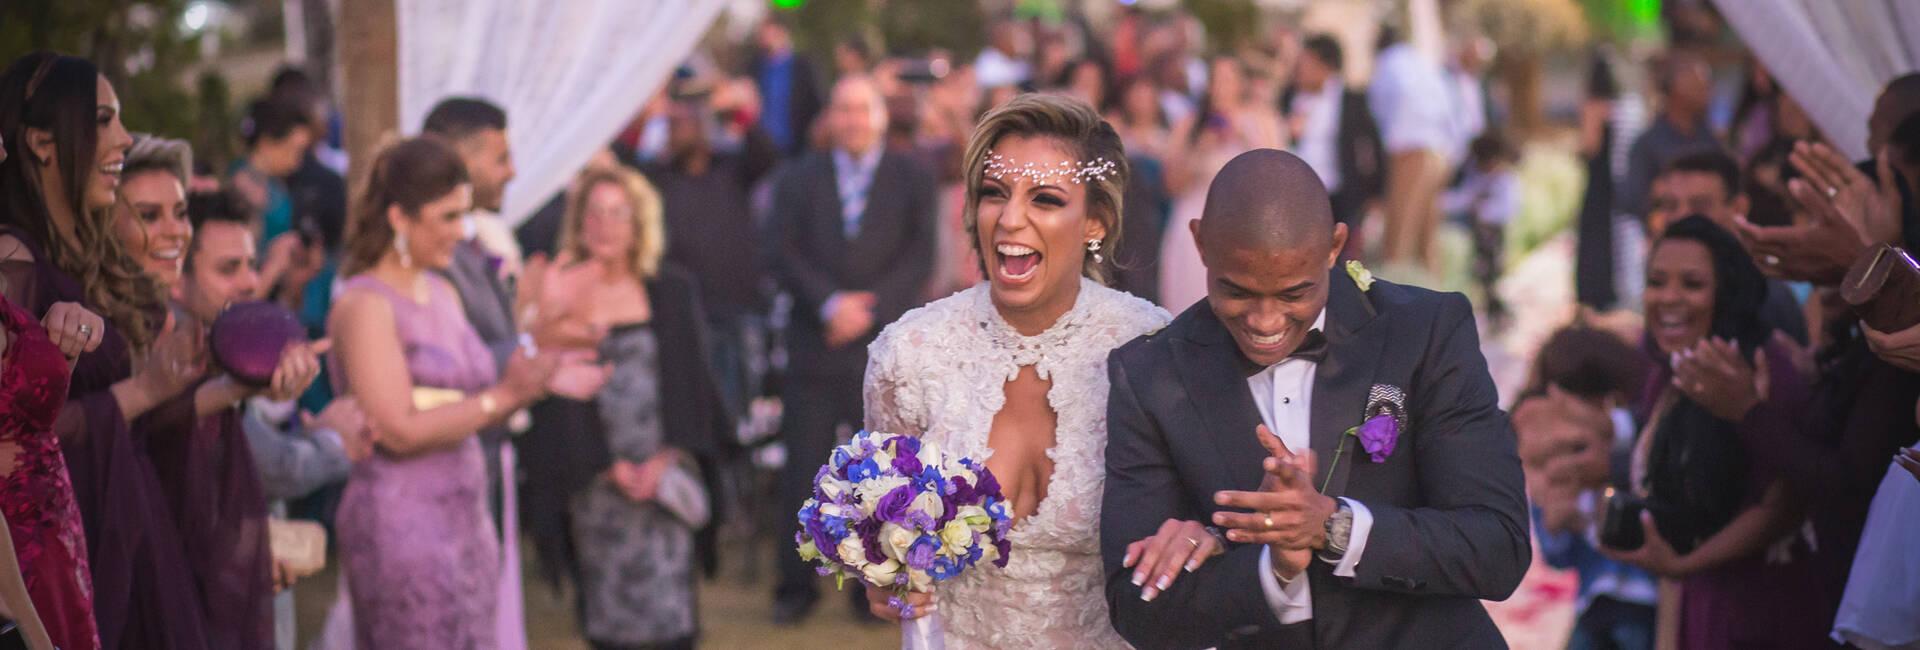 Casamento de DANI & ROBERTO